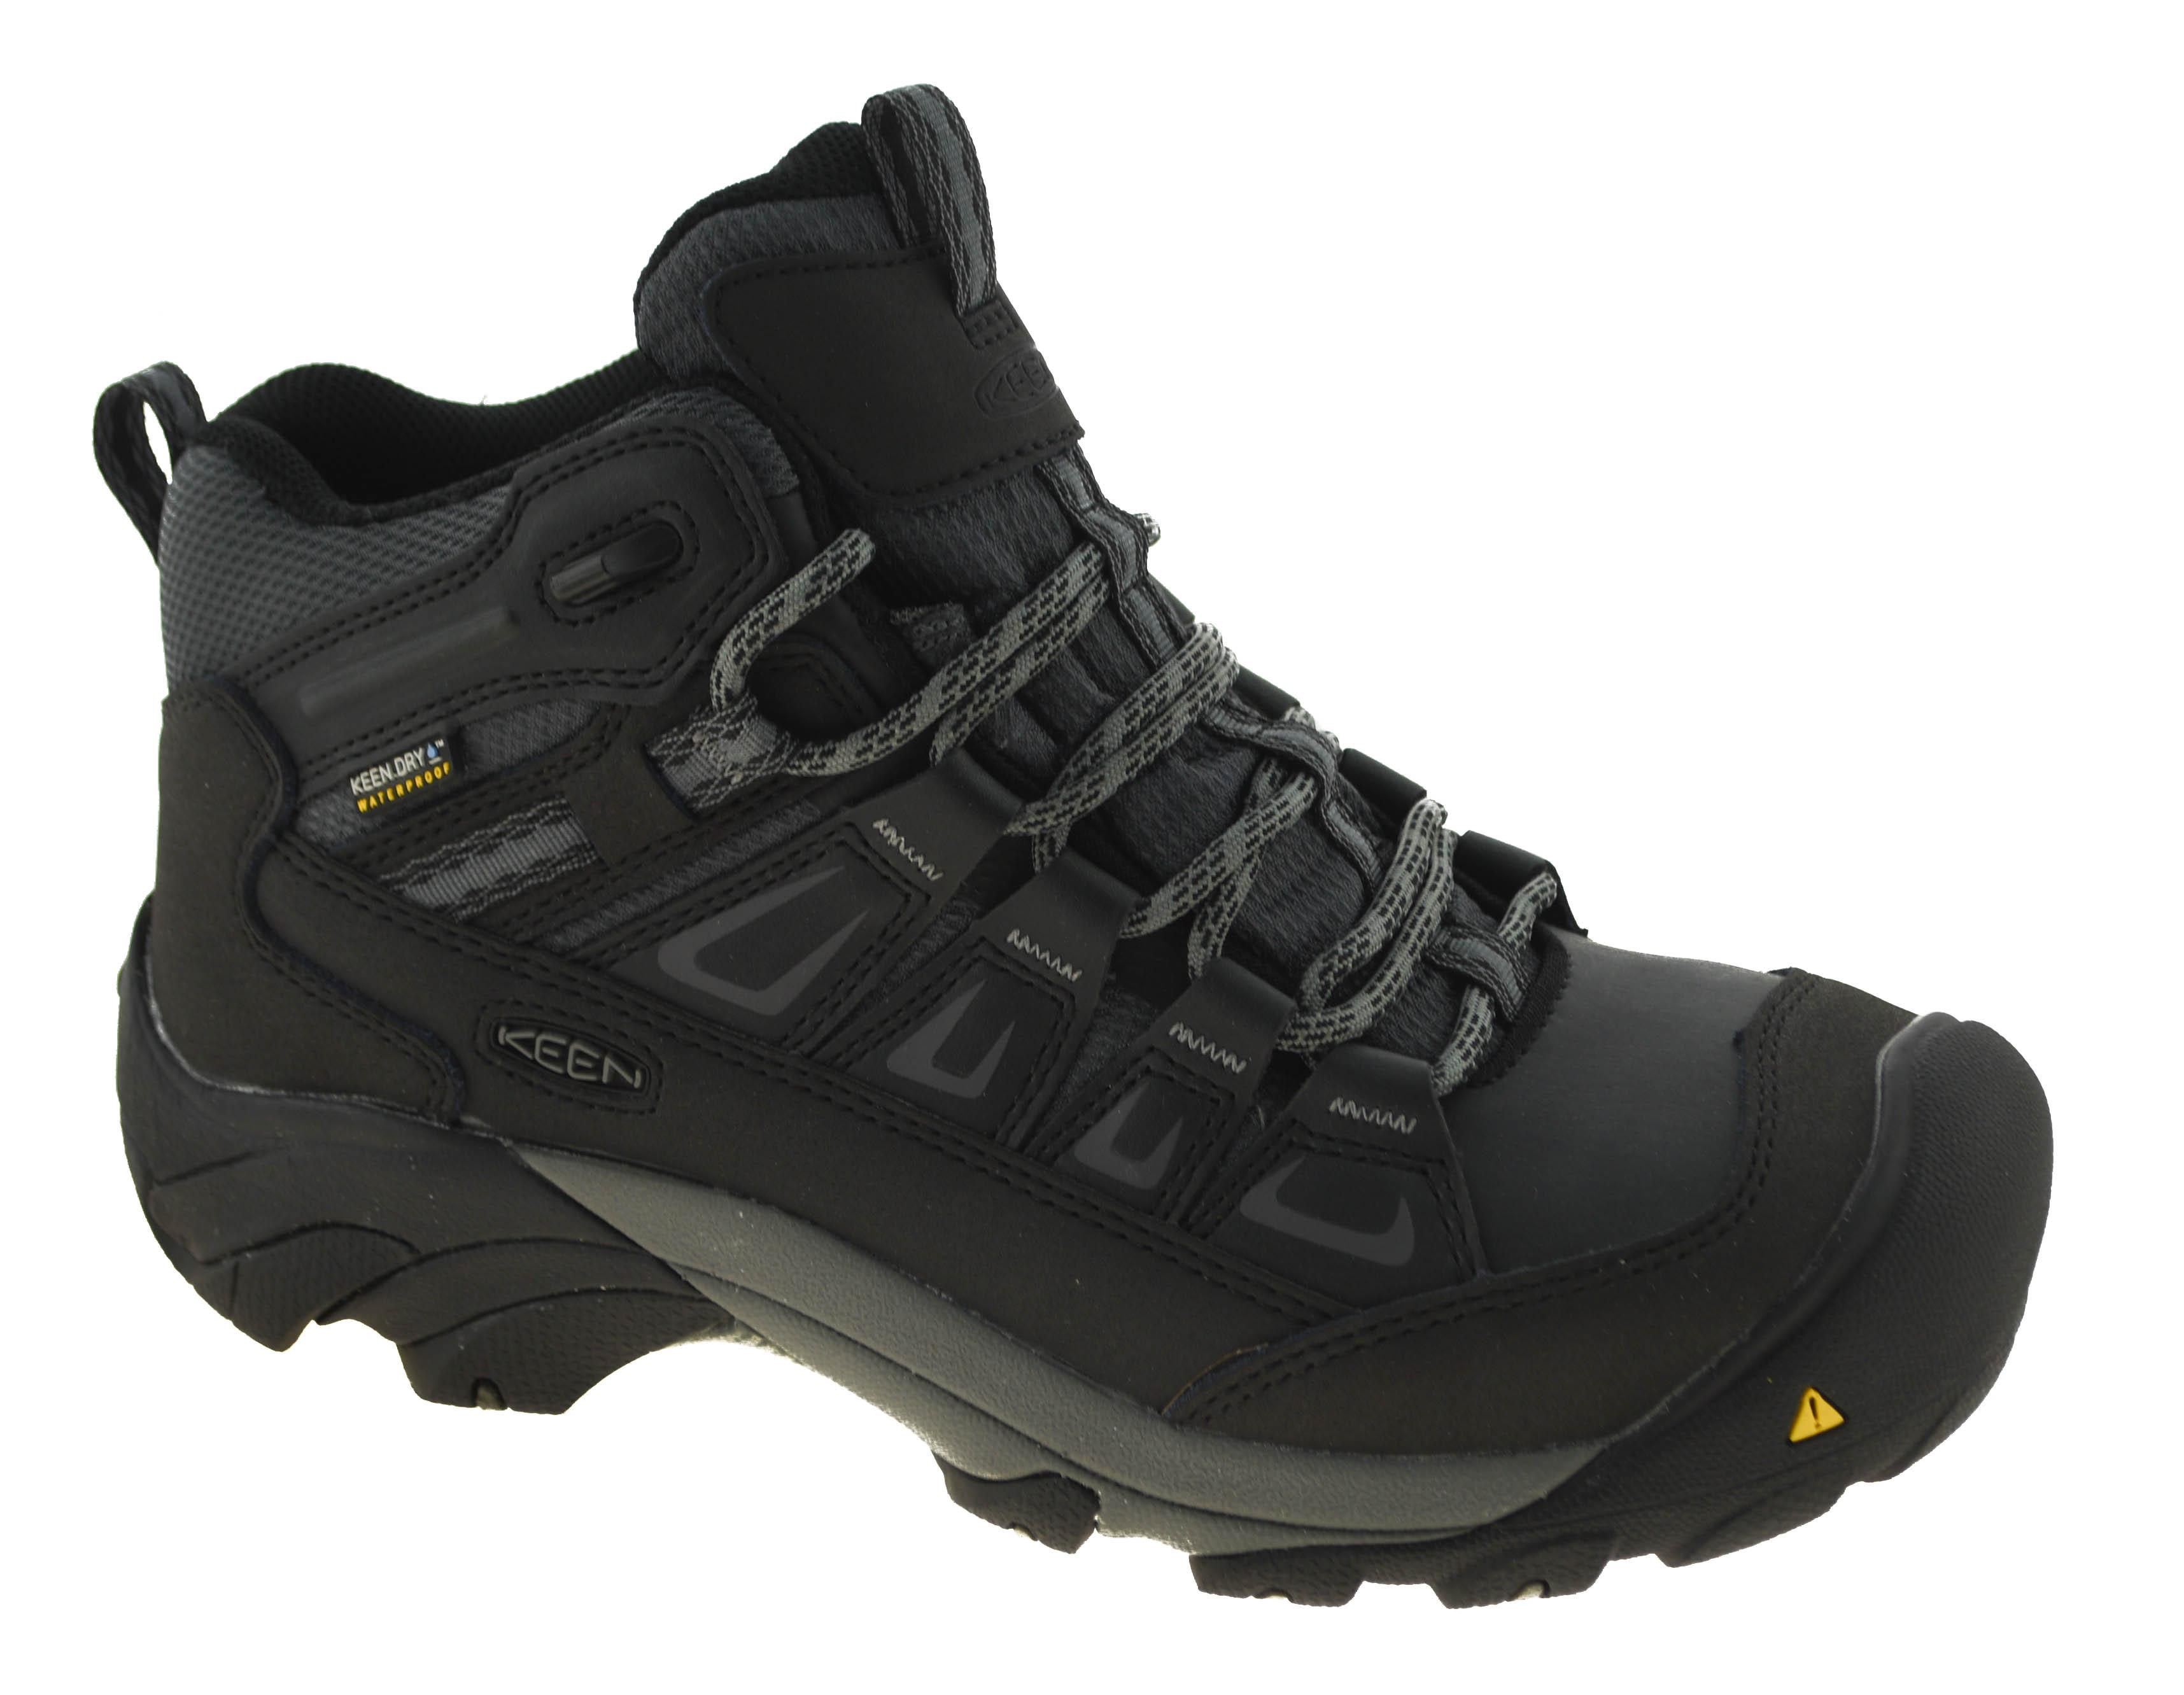 5e33a0ee5d4 Details about Keen Utility Men's Boulder Waterproof Steel Toe Work Boots  Style 1018653